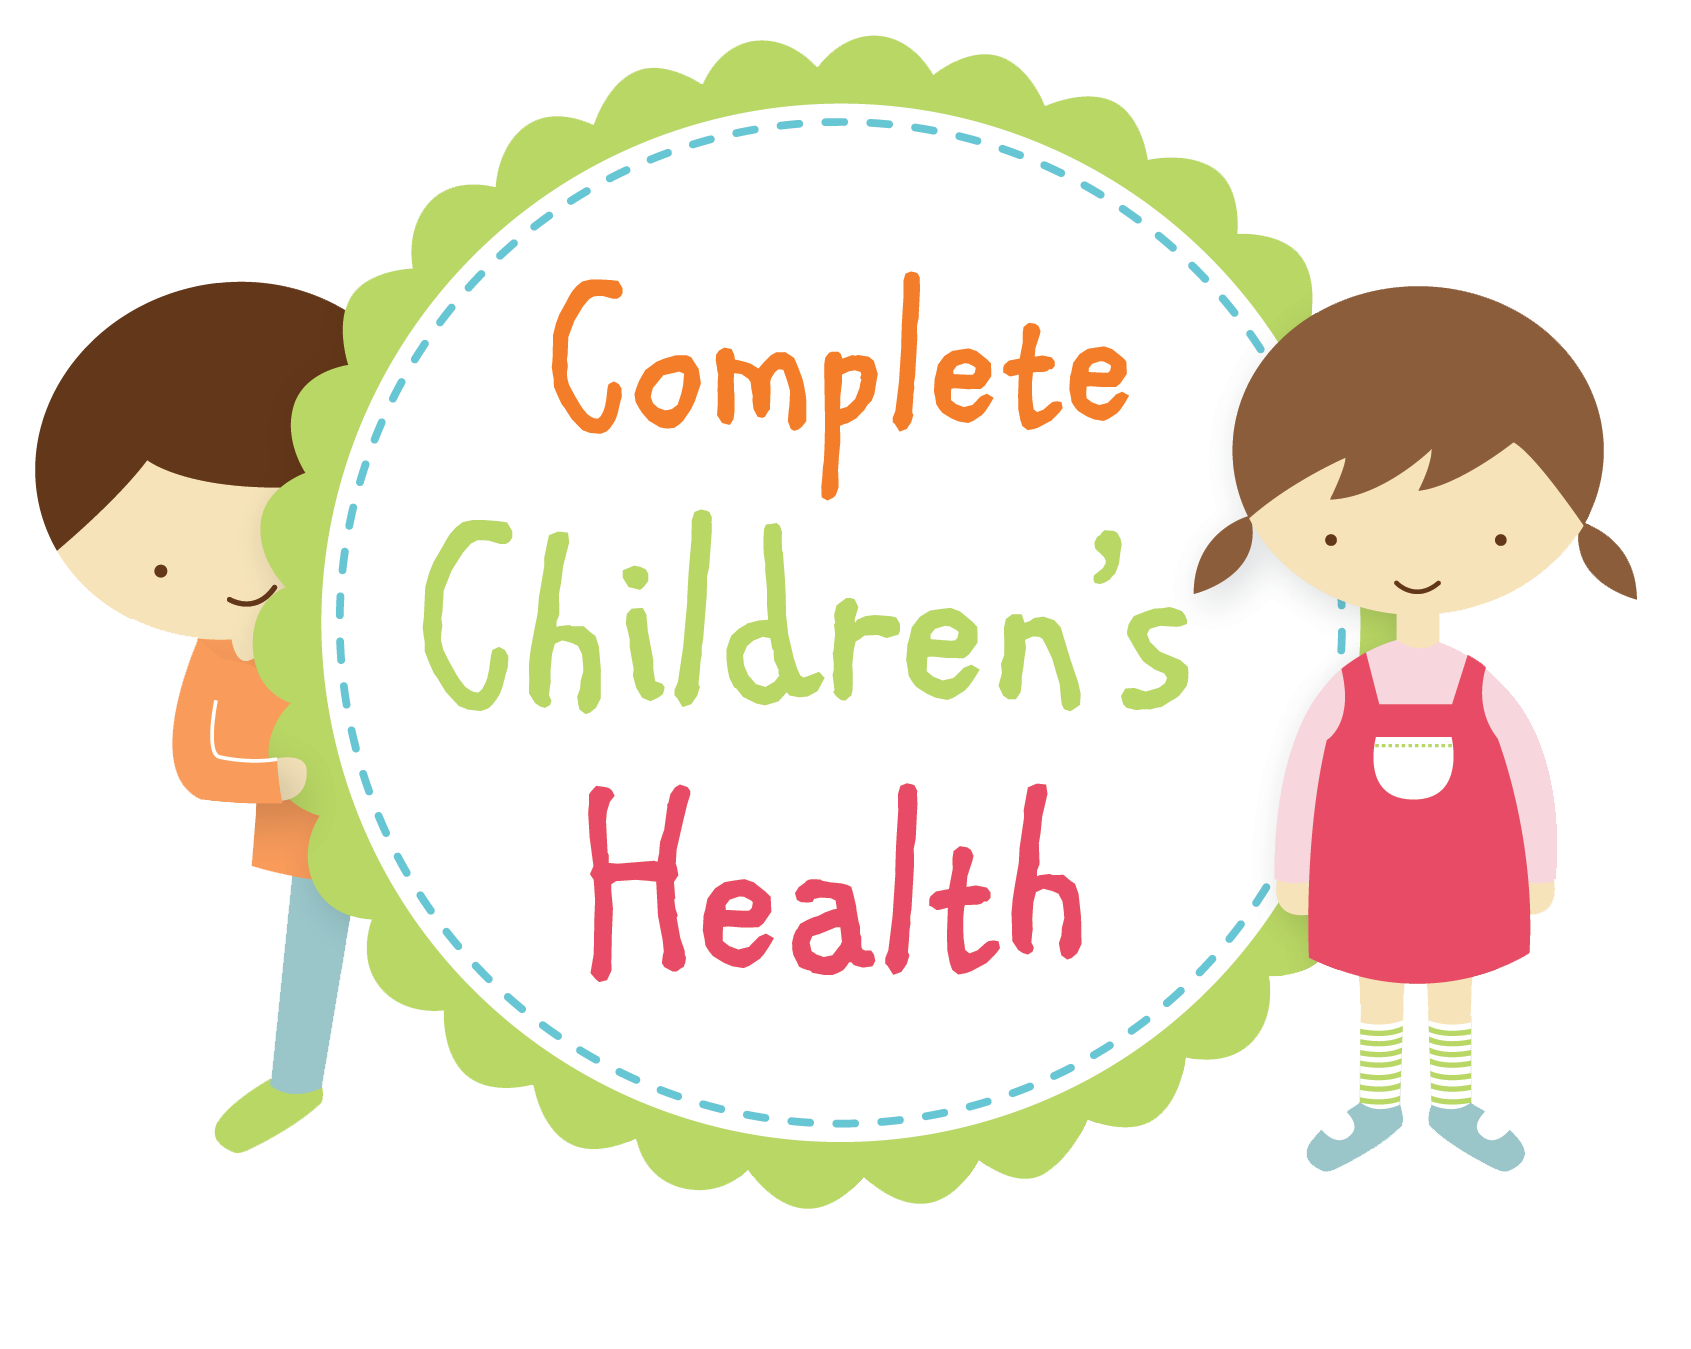 Complete children s leading. Health clipart children's